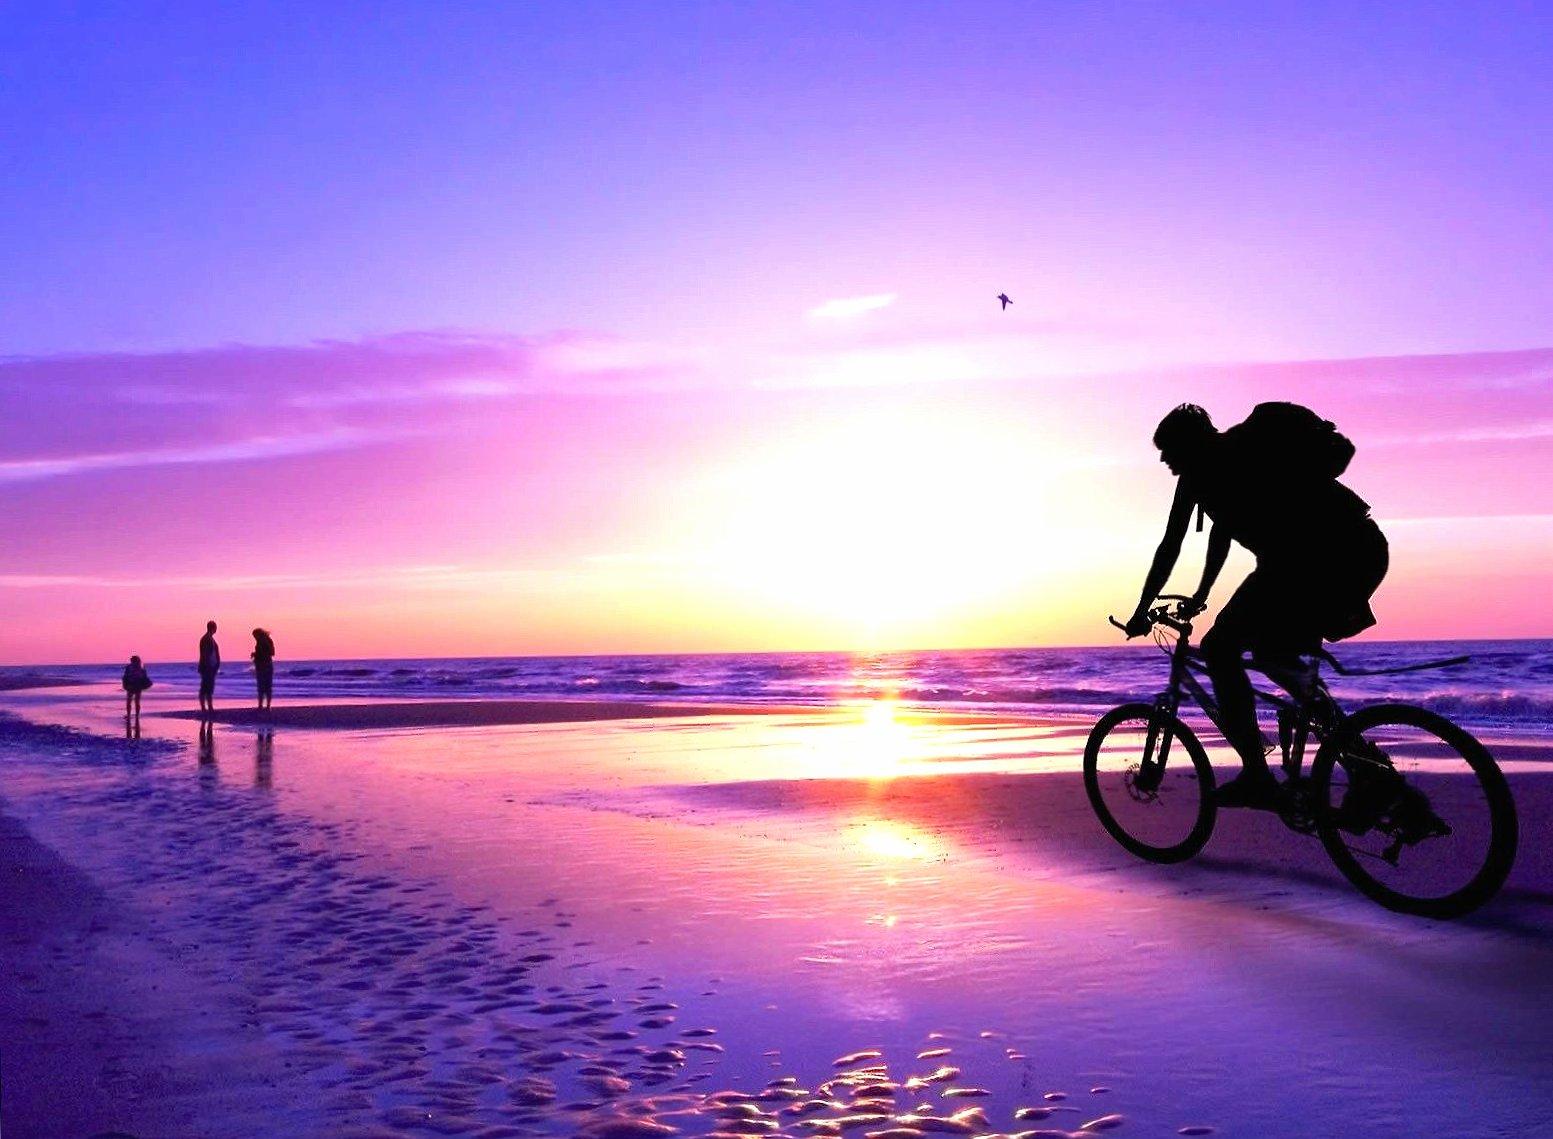 Sea sunset biker wallpapers HD quality